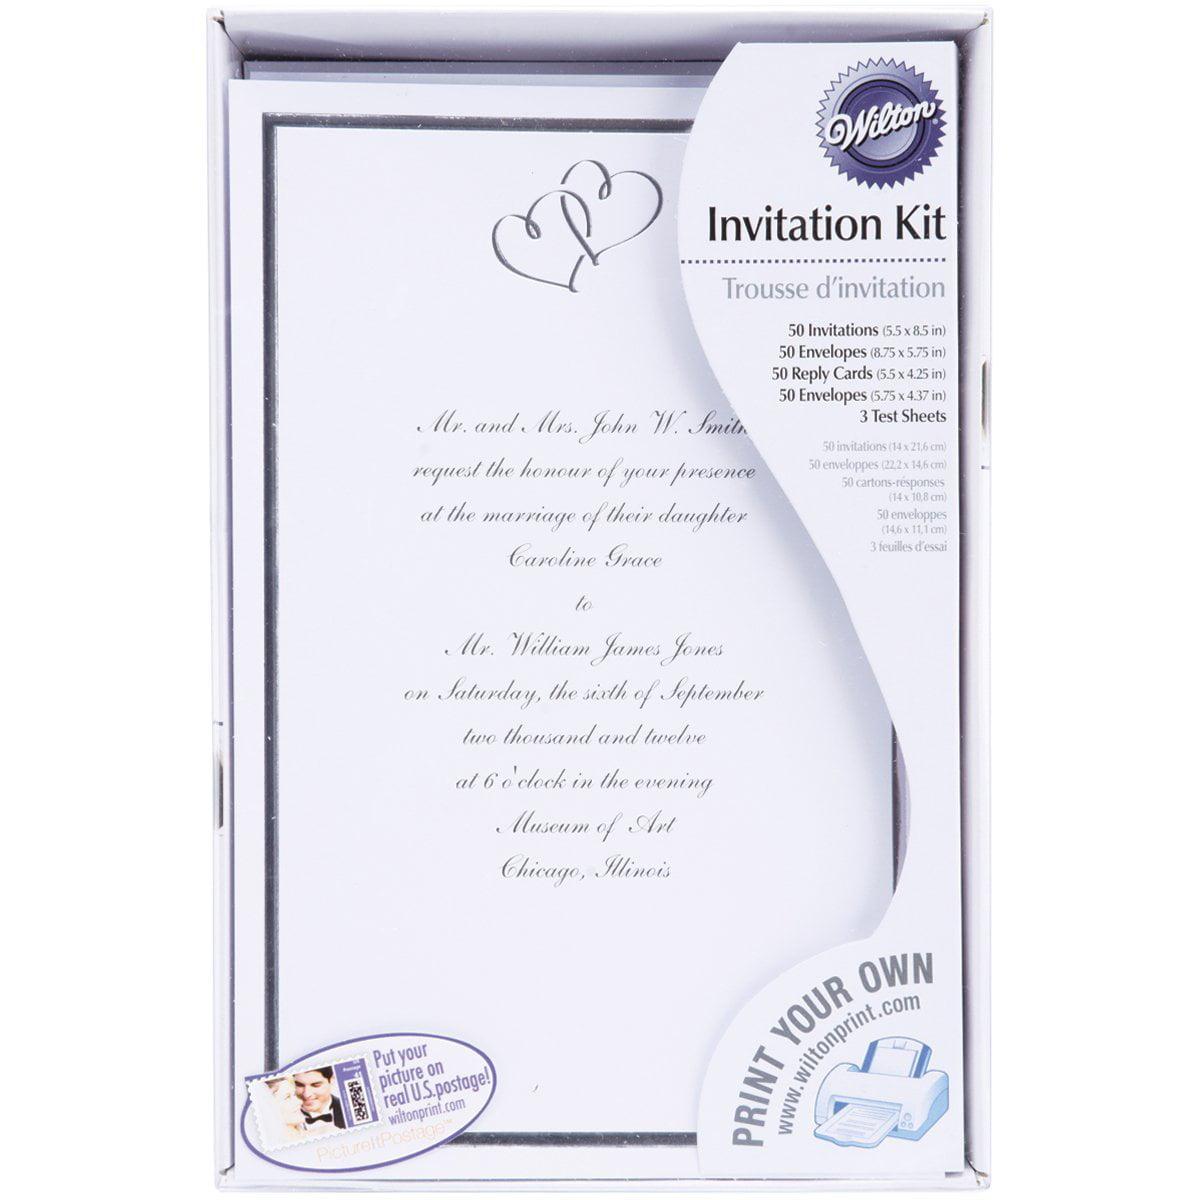 Wilton Print-Your-Own Invitations Kit Silver Sweethearts, 50 ct. 1008-668 - Walmart.com